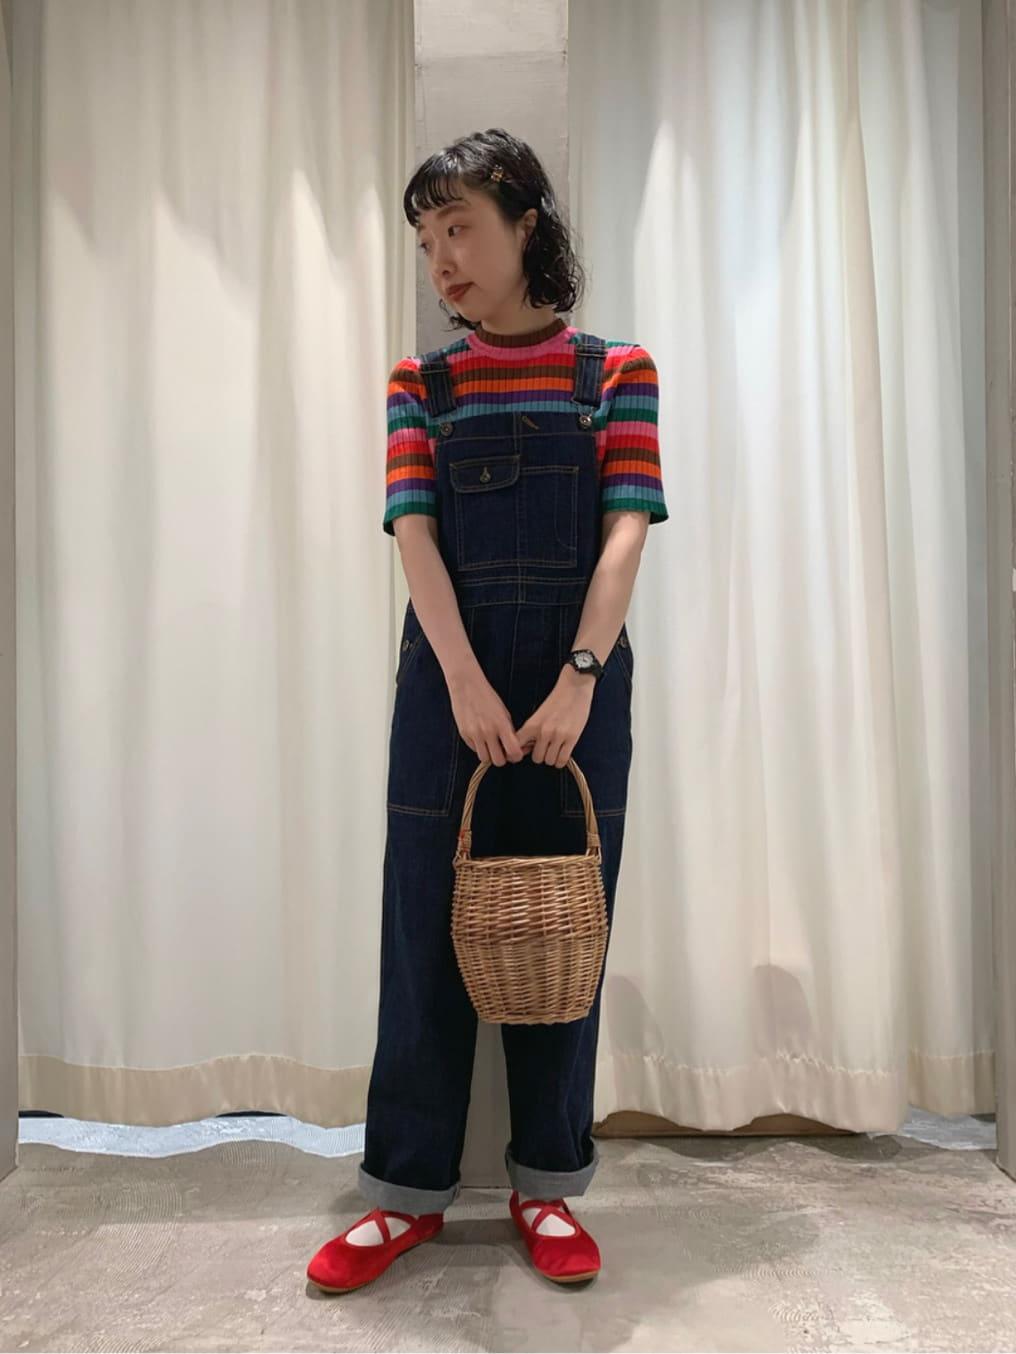 - CHILD WOMAN CHILD WOMAN , PAR ICI ルミネ横浜 身長:157cm 2021.07.21